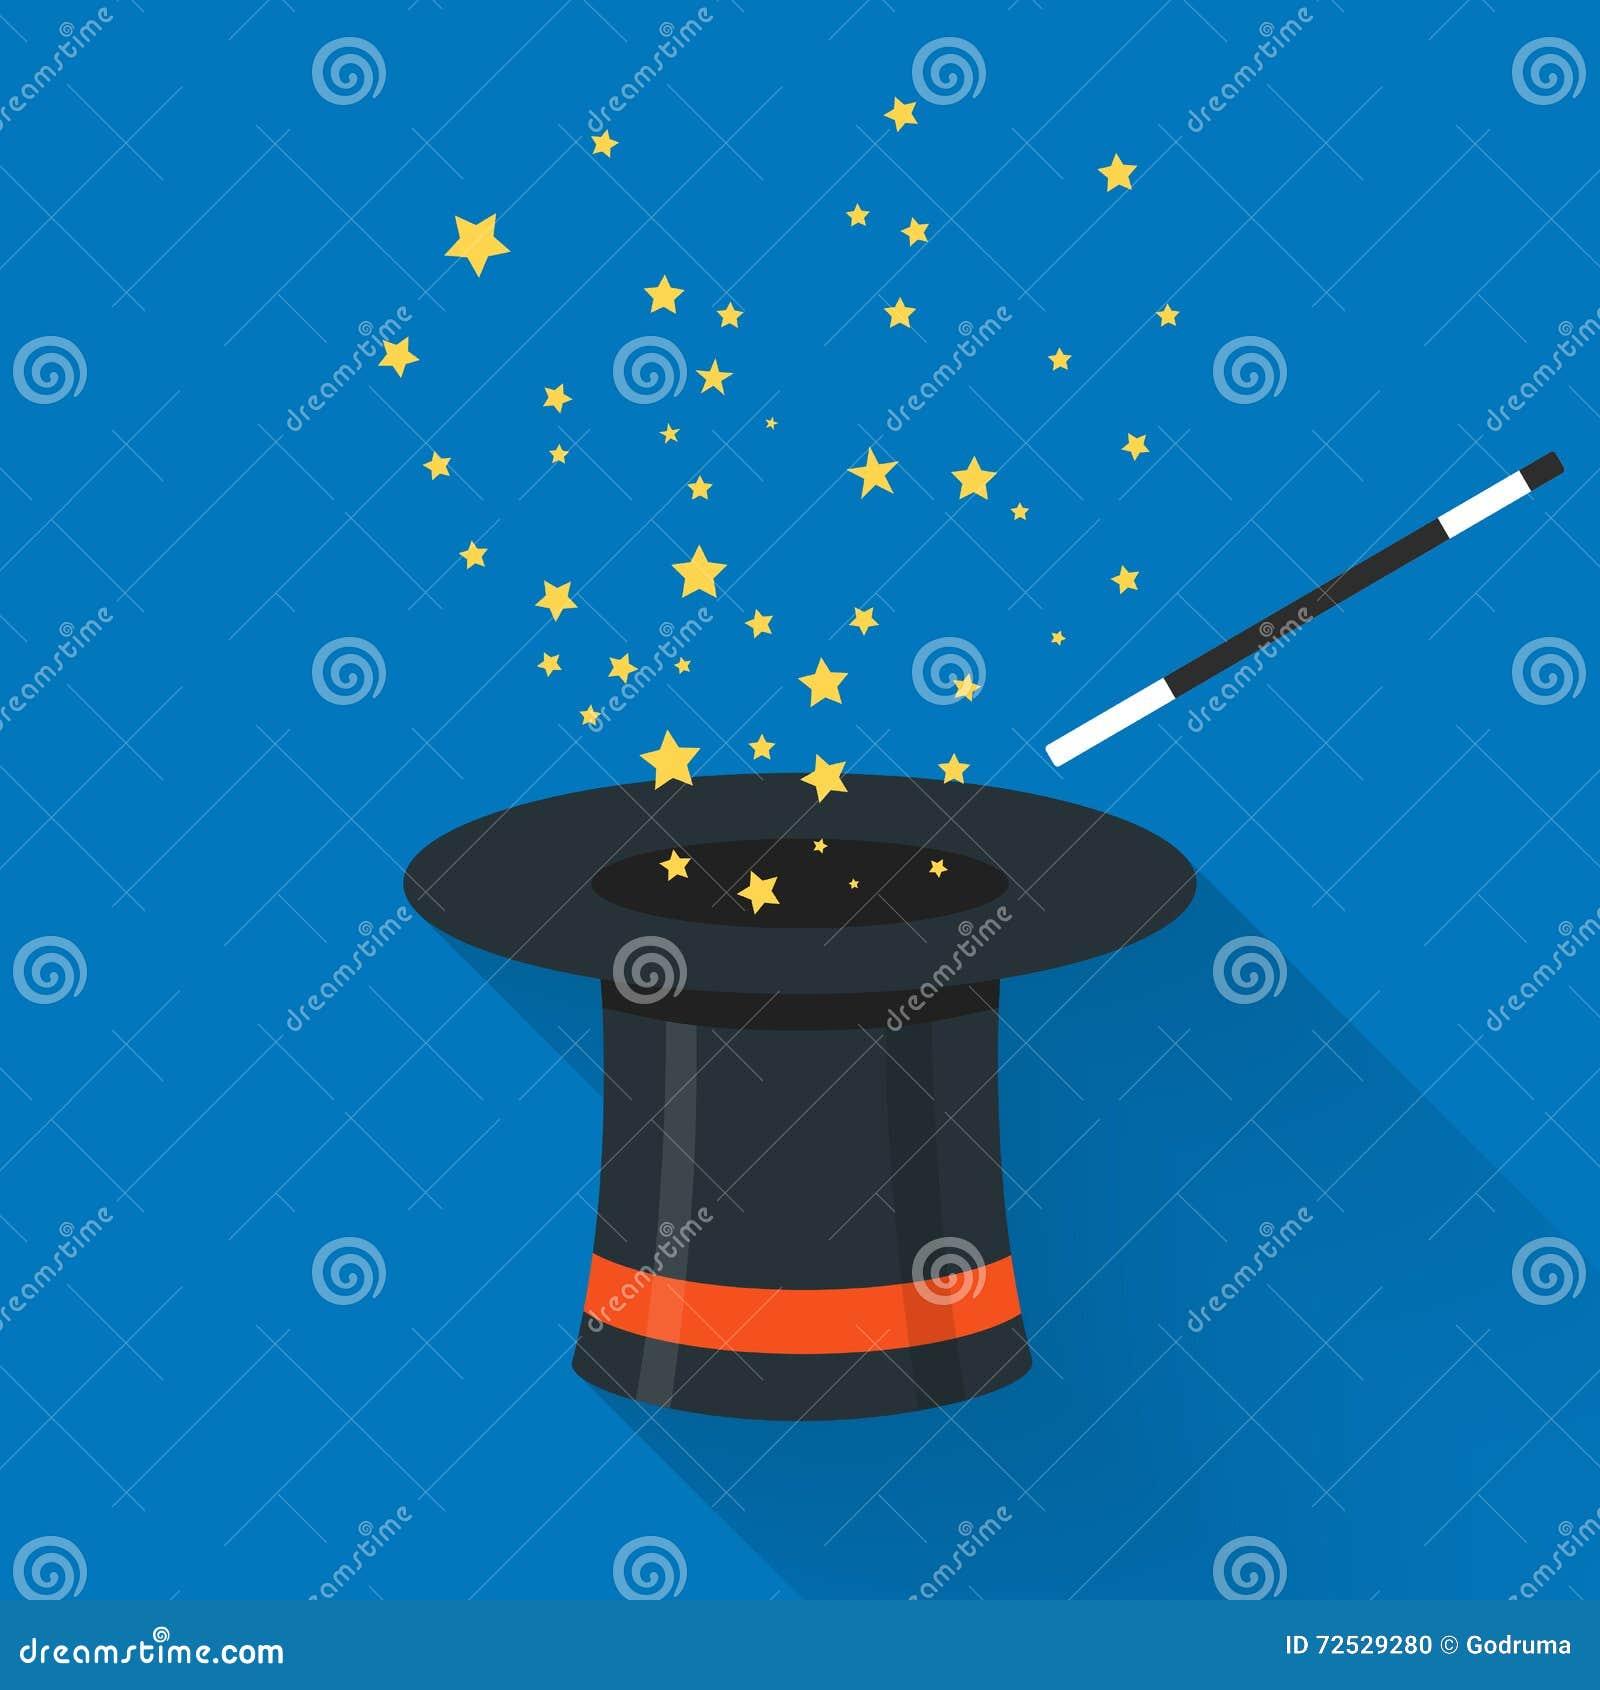 Abracadabra Cartoon Concept. Magic Wand With Stars Sparks Above ...